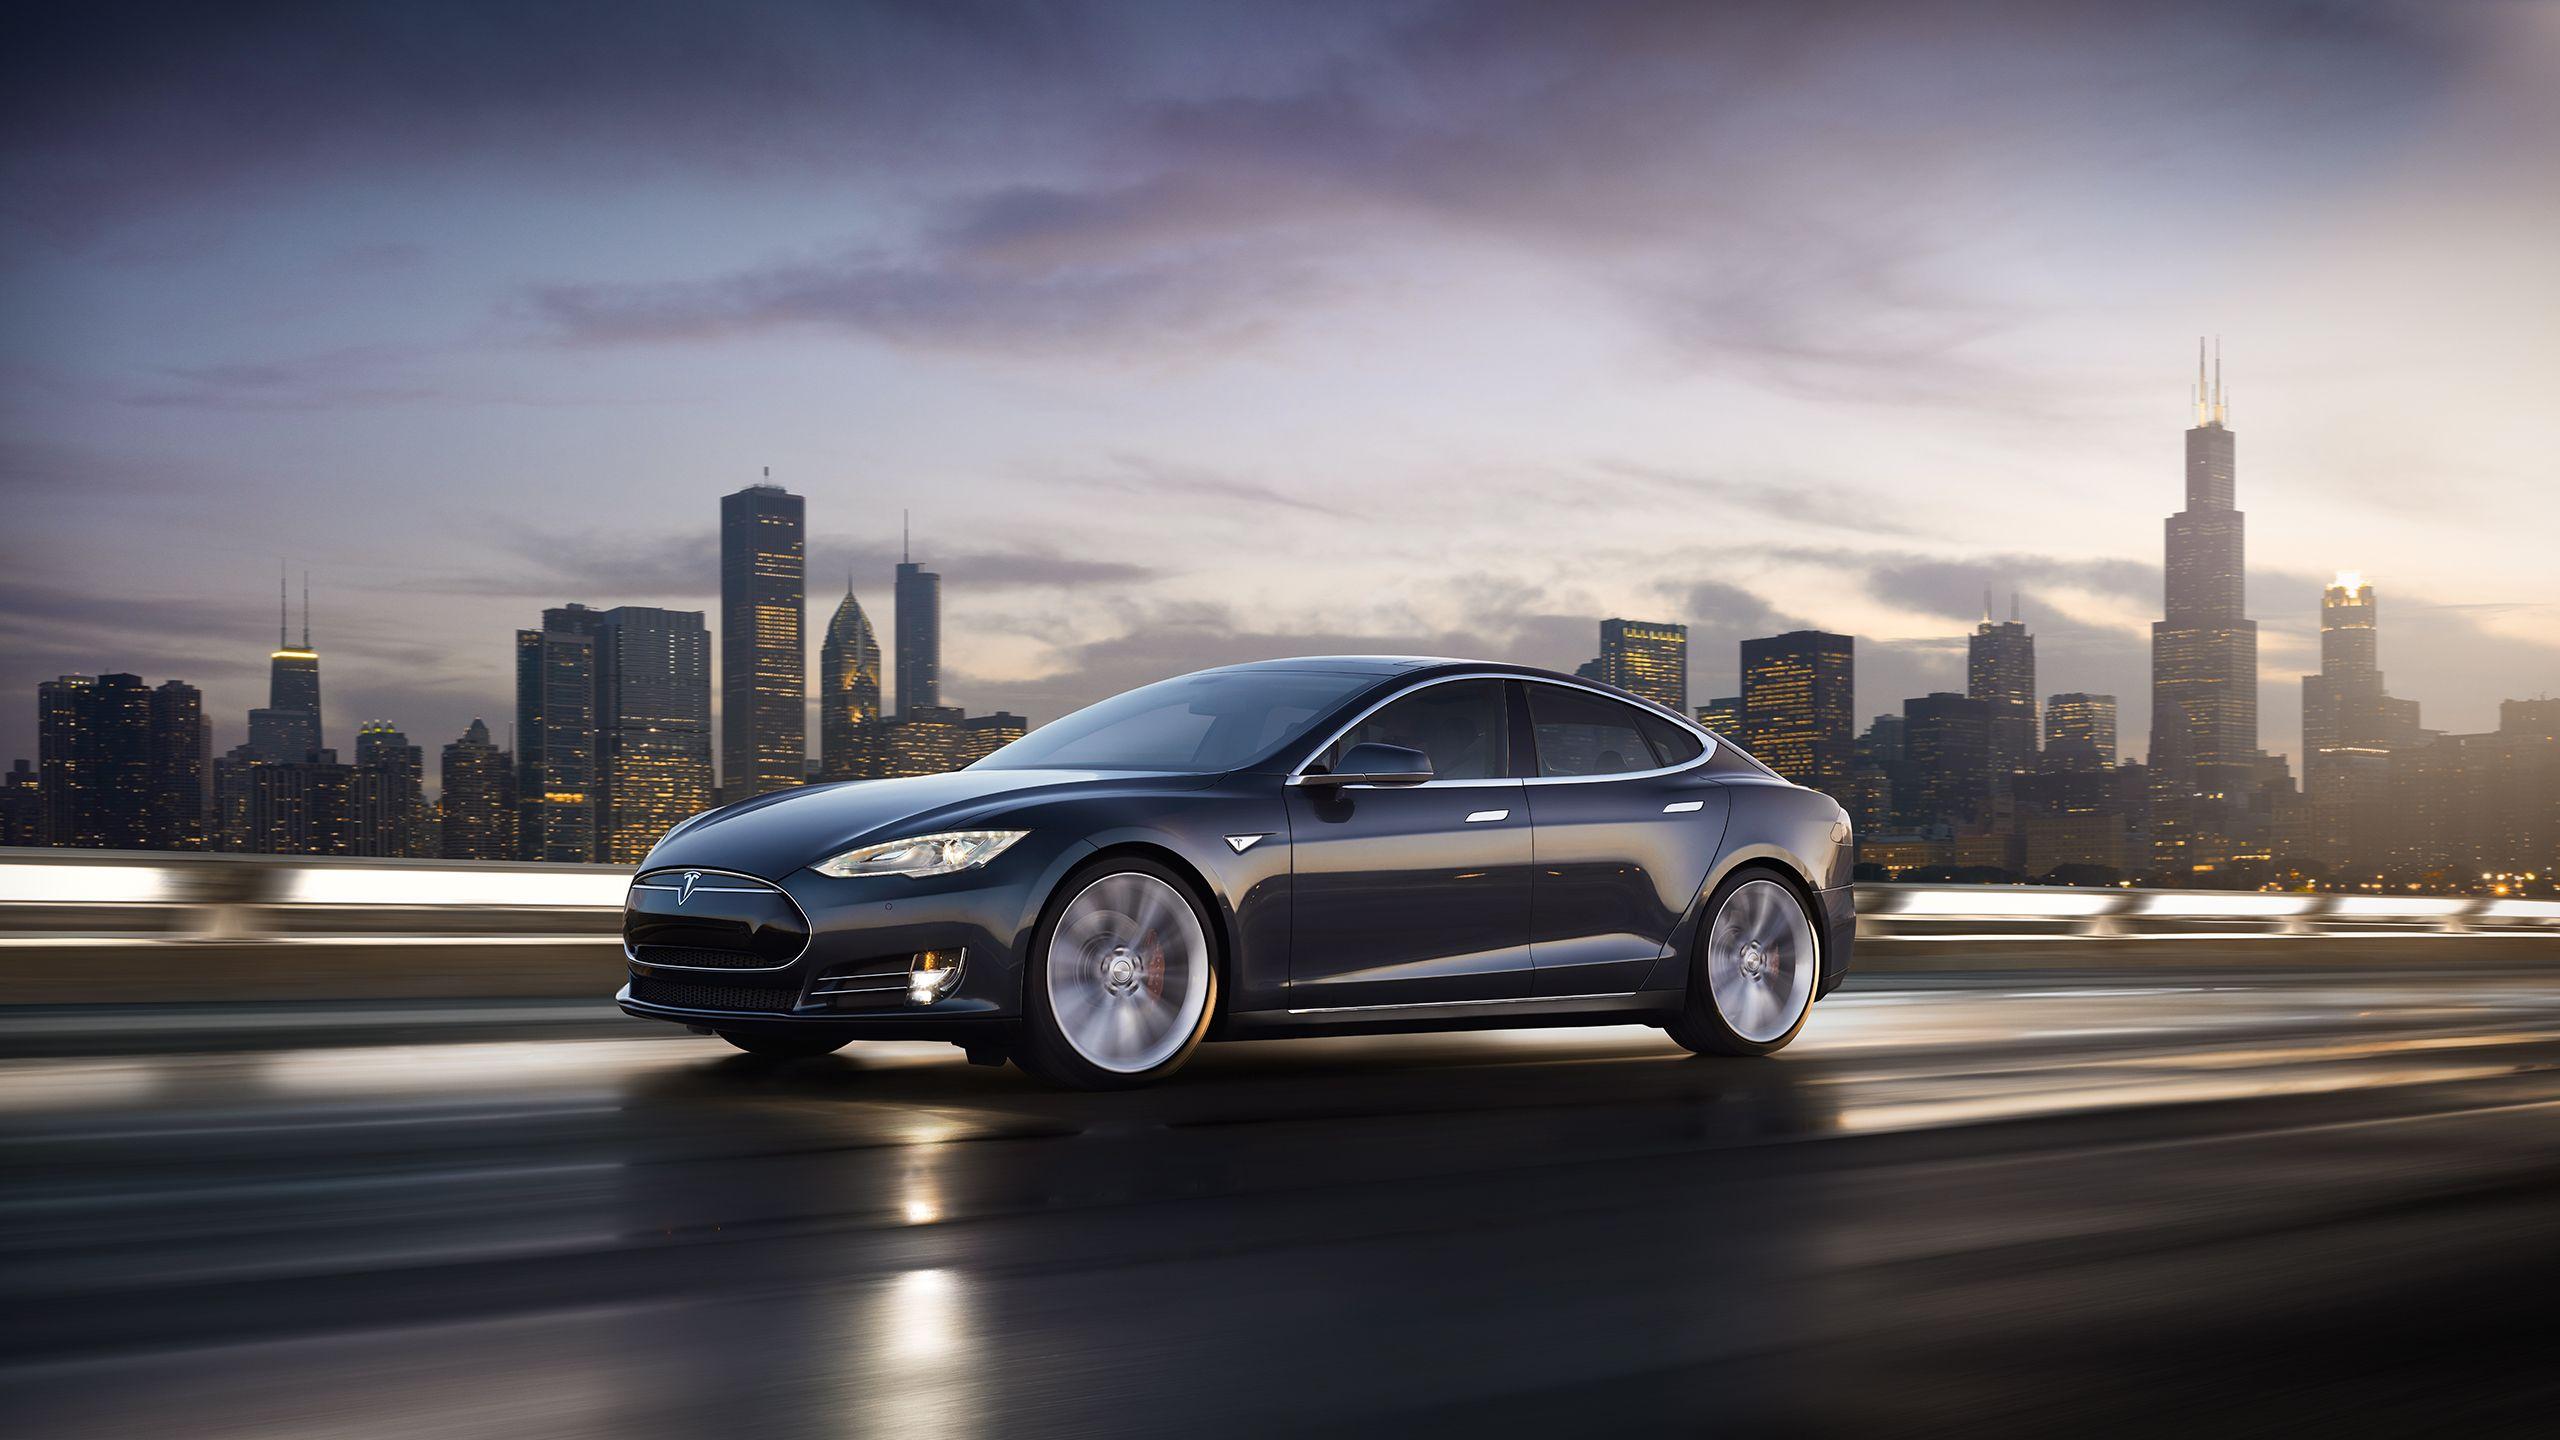 35 Tesla Model 3 Wallpapers On Wallpapersafari